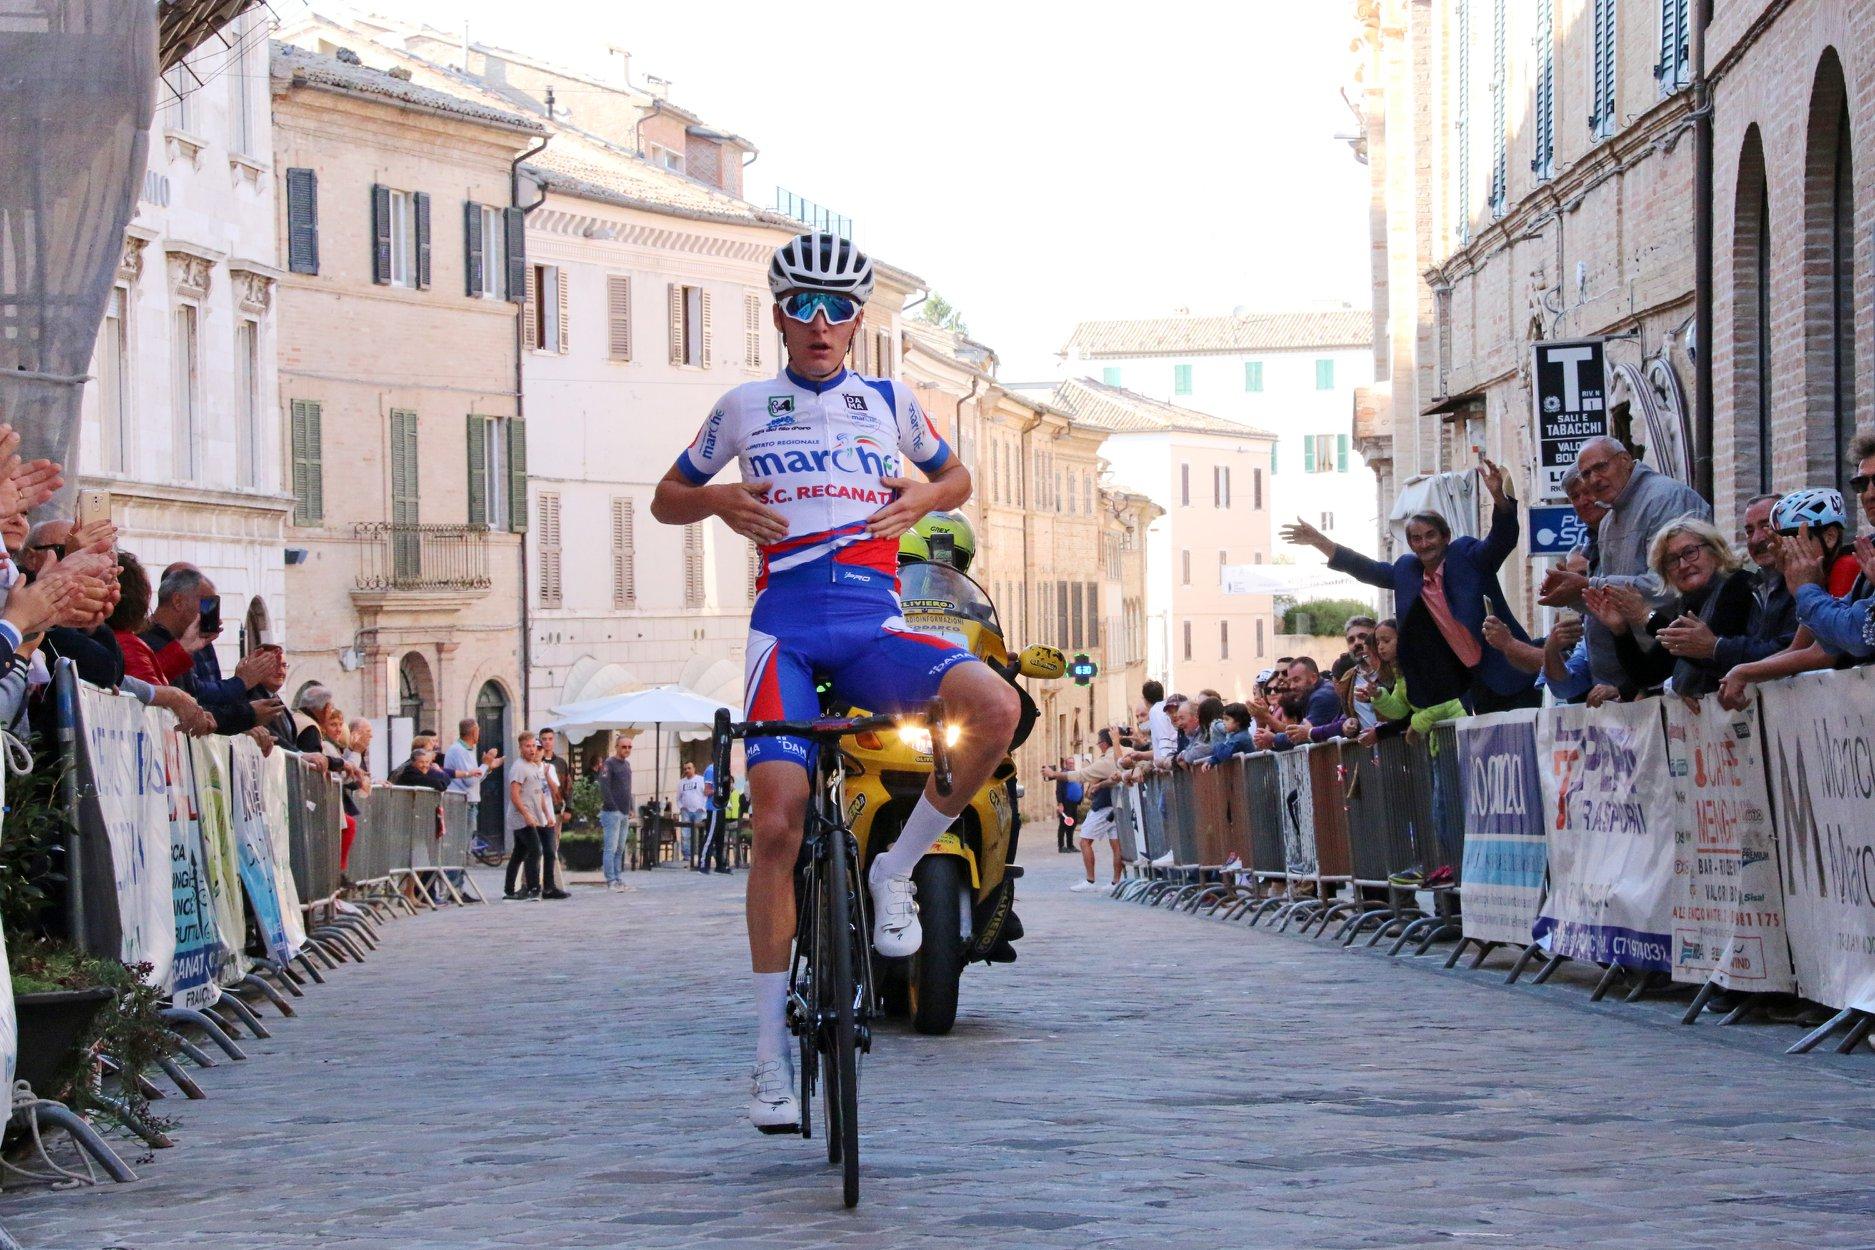 Gianmarco Garofolivince la30/a Leopardiana Sarnano